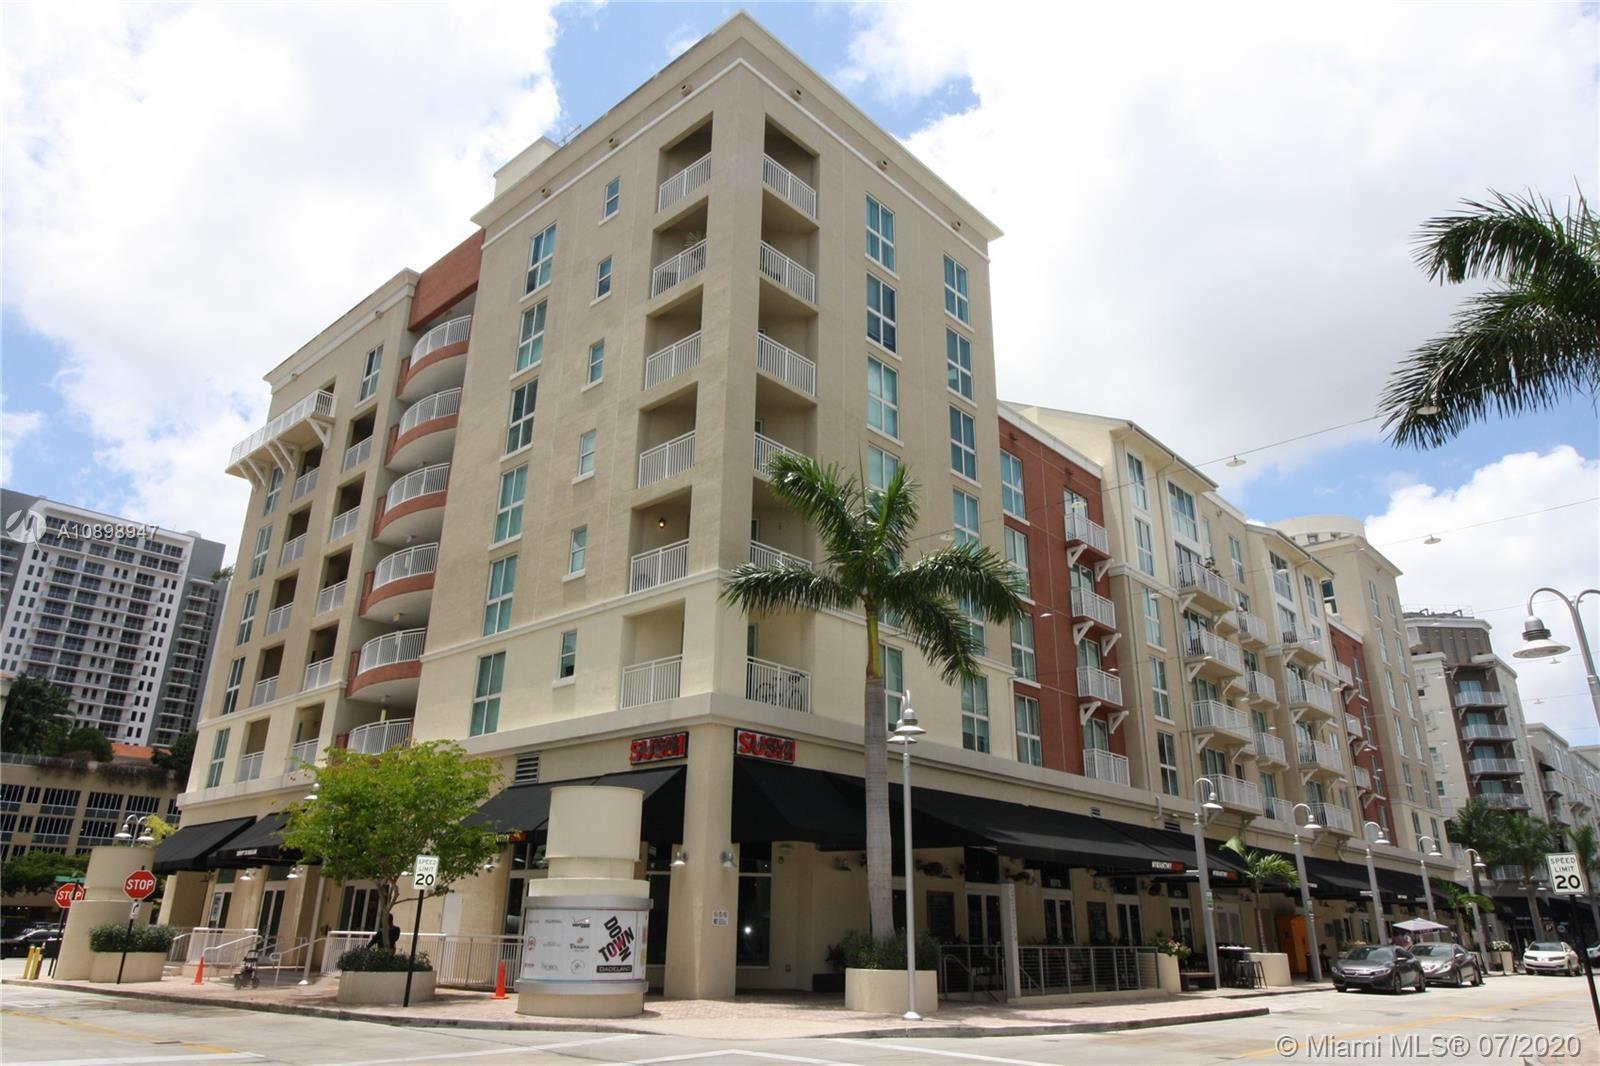 7285 SW 90 ST #D313, Miami, FL 33156 - #: A10898947